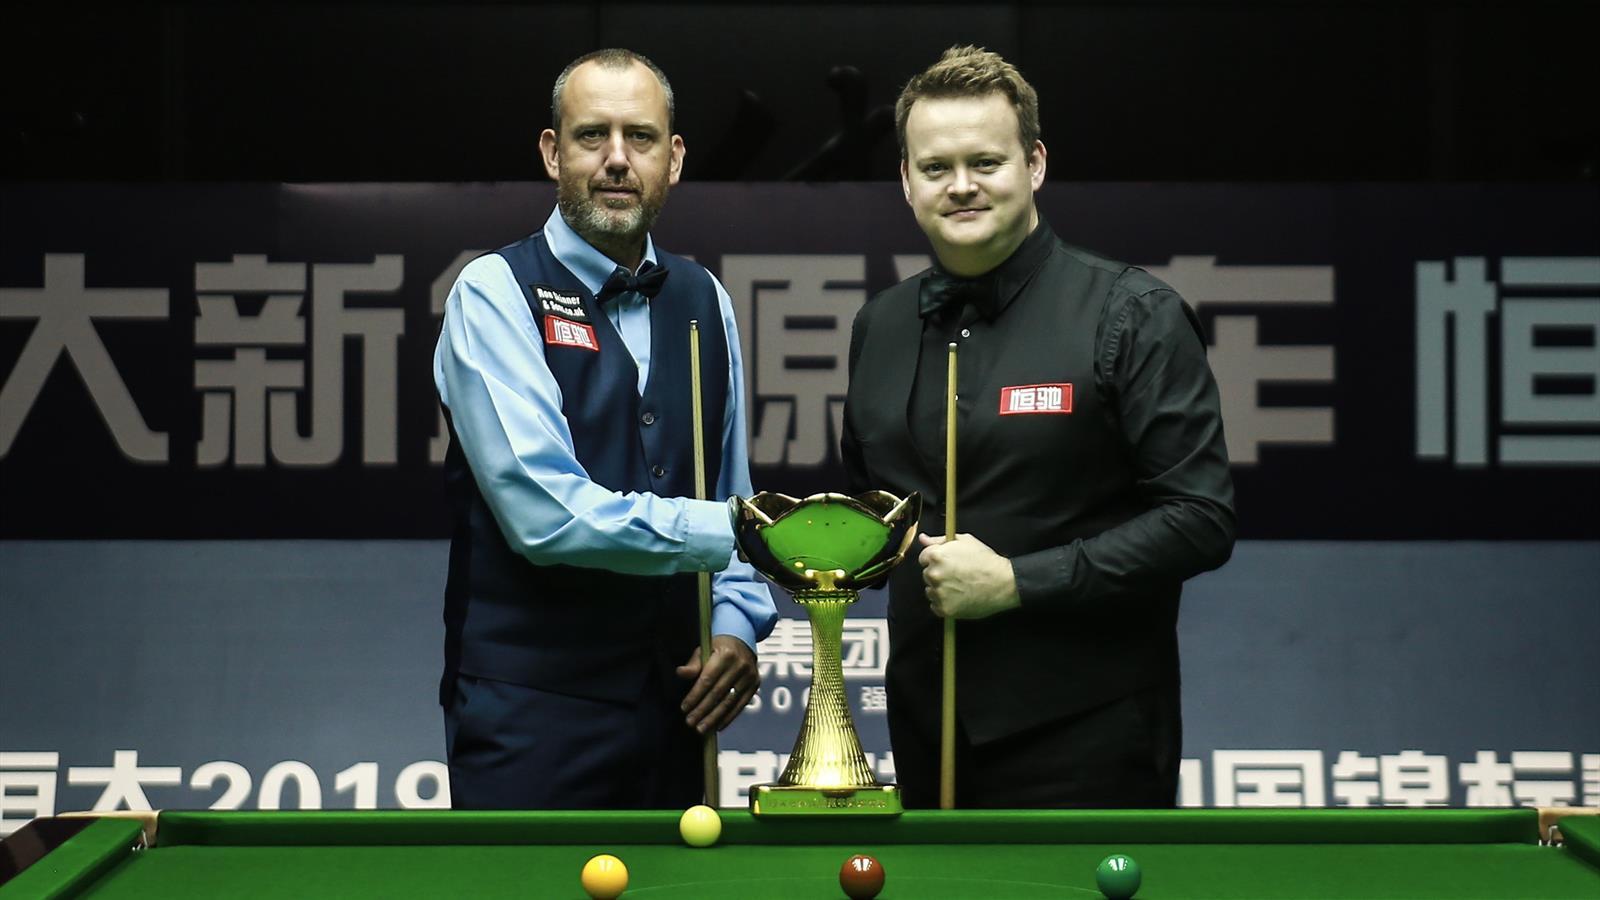 Snooker china championship 2020